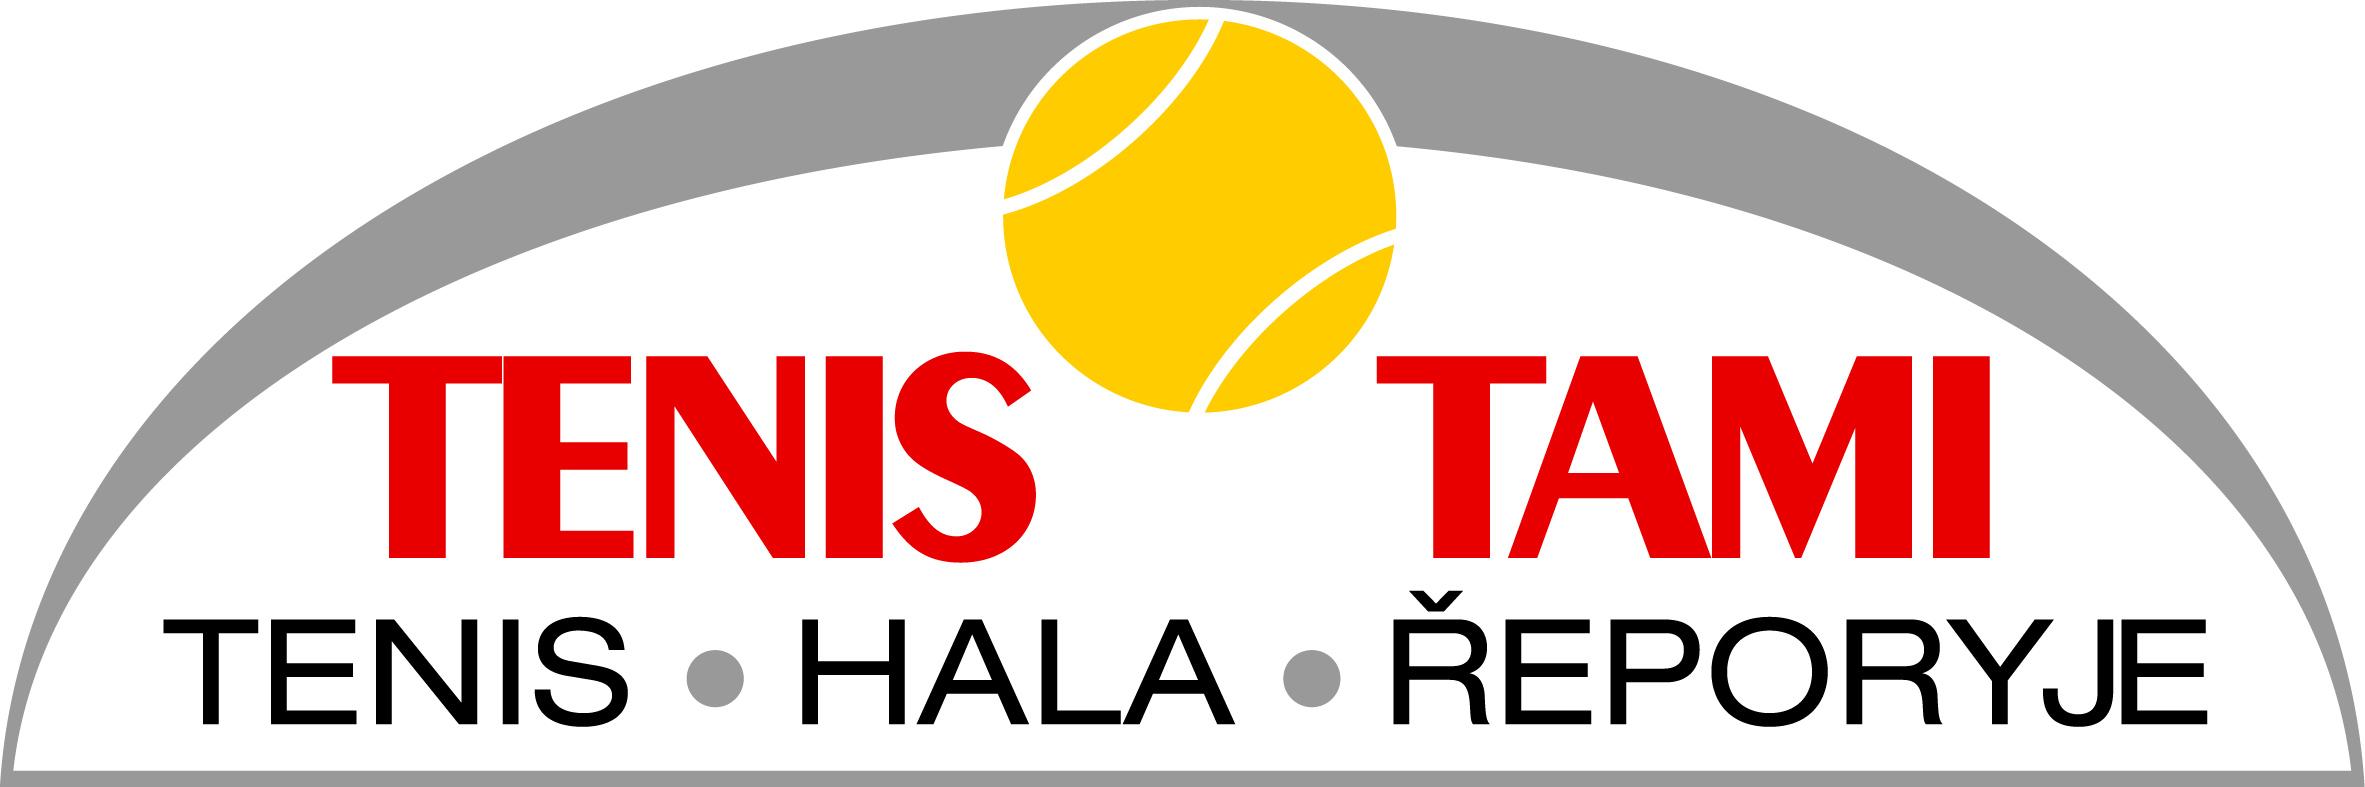 10 Tenis Tami Team